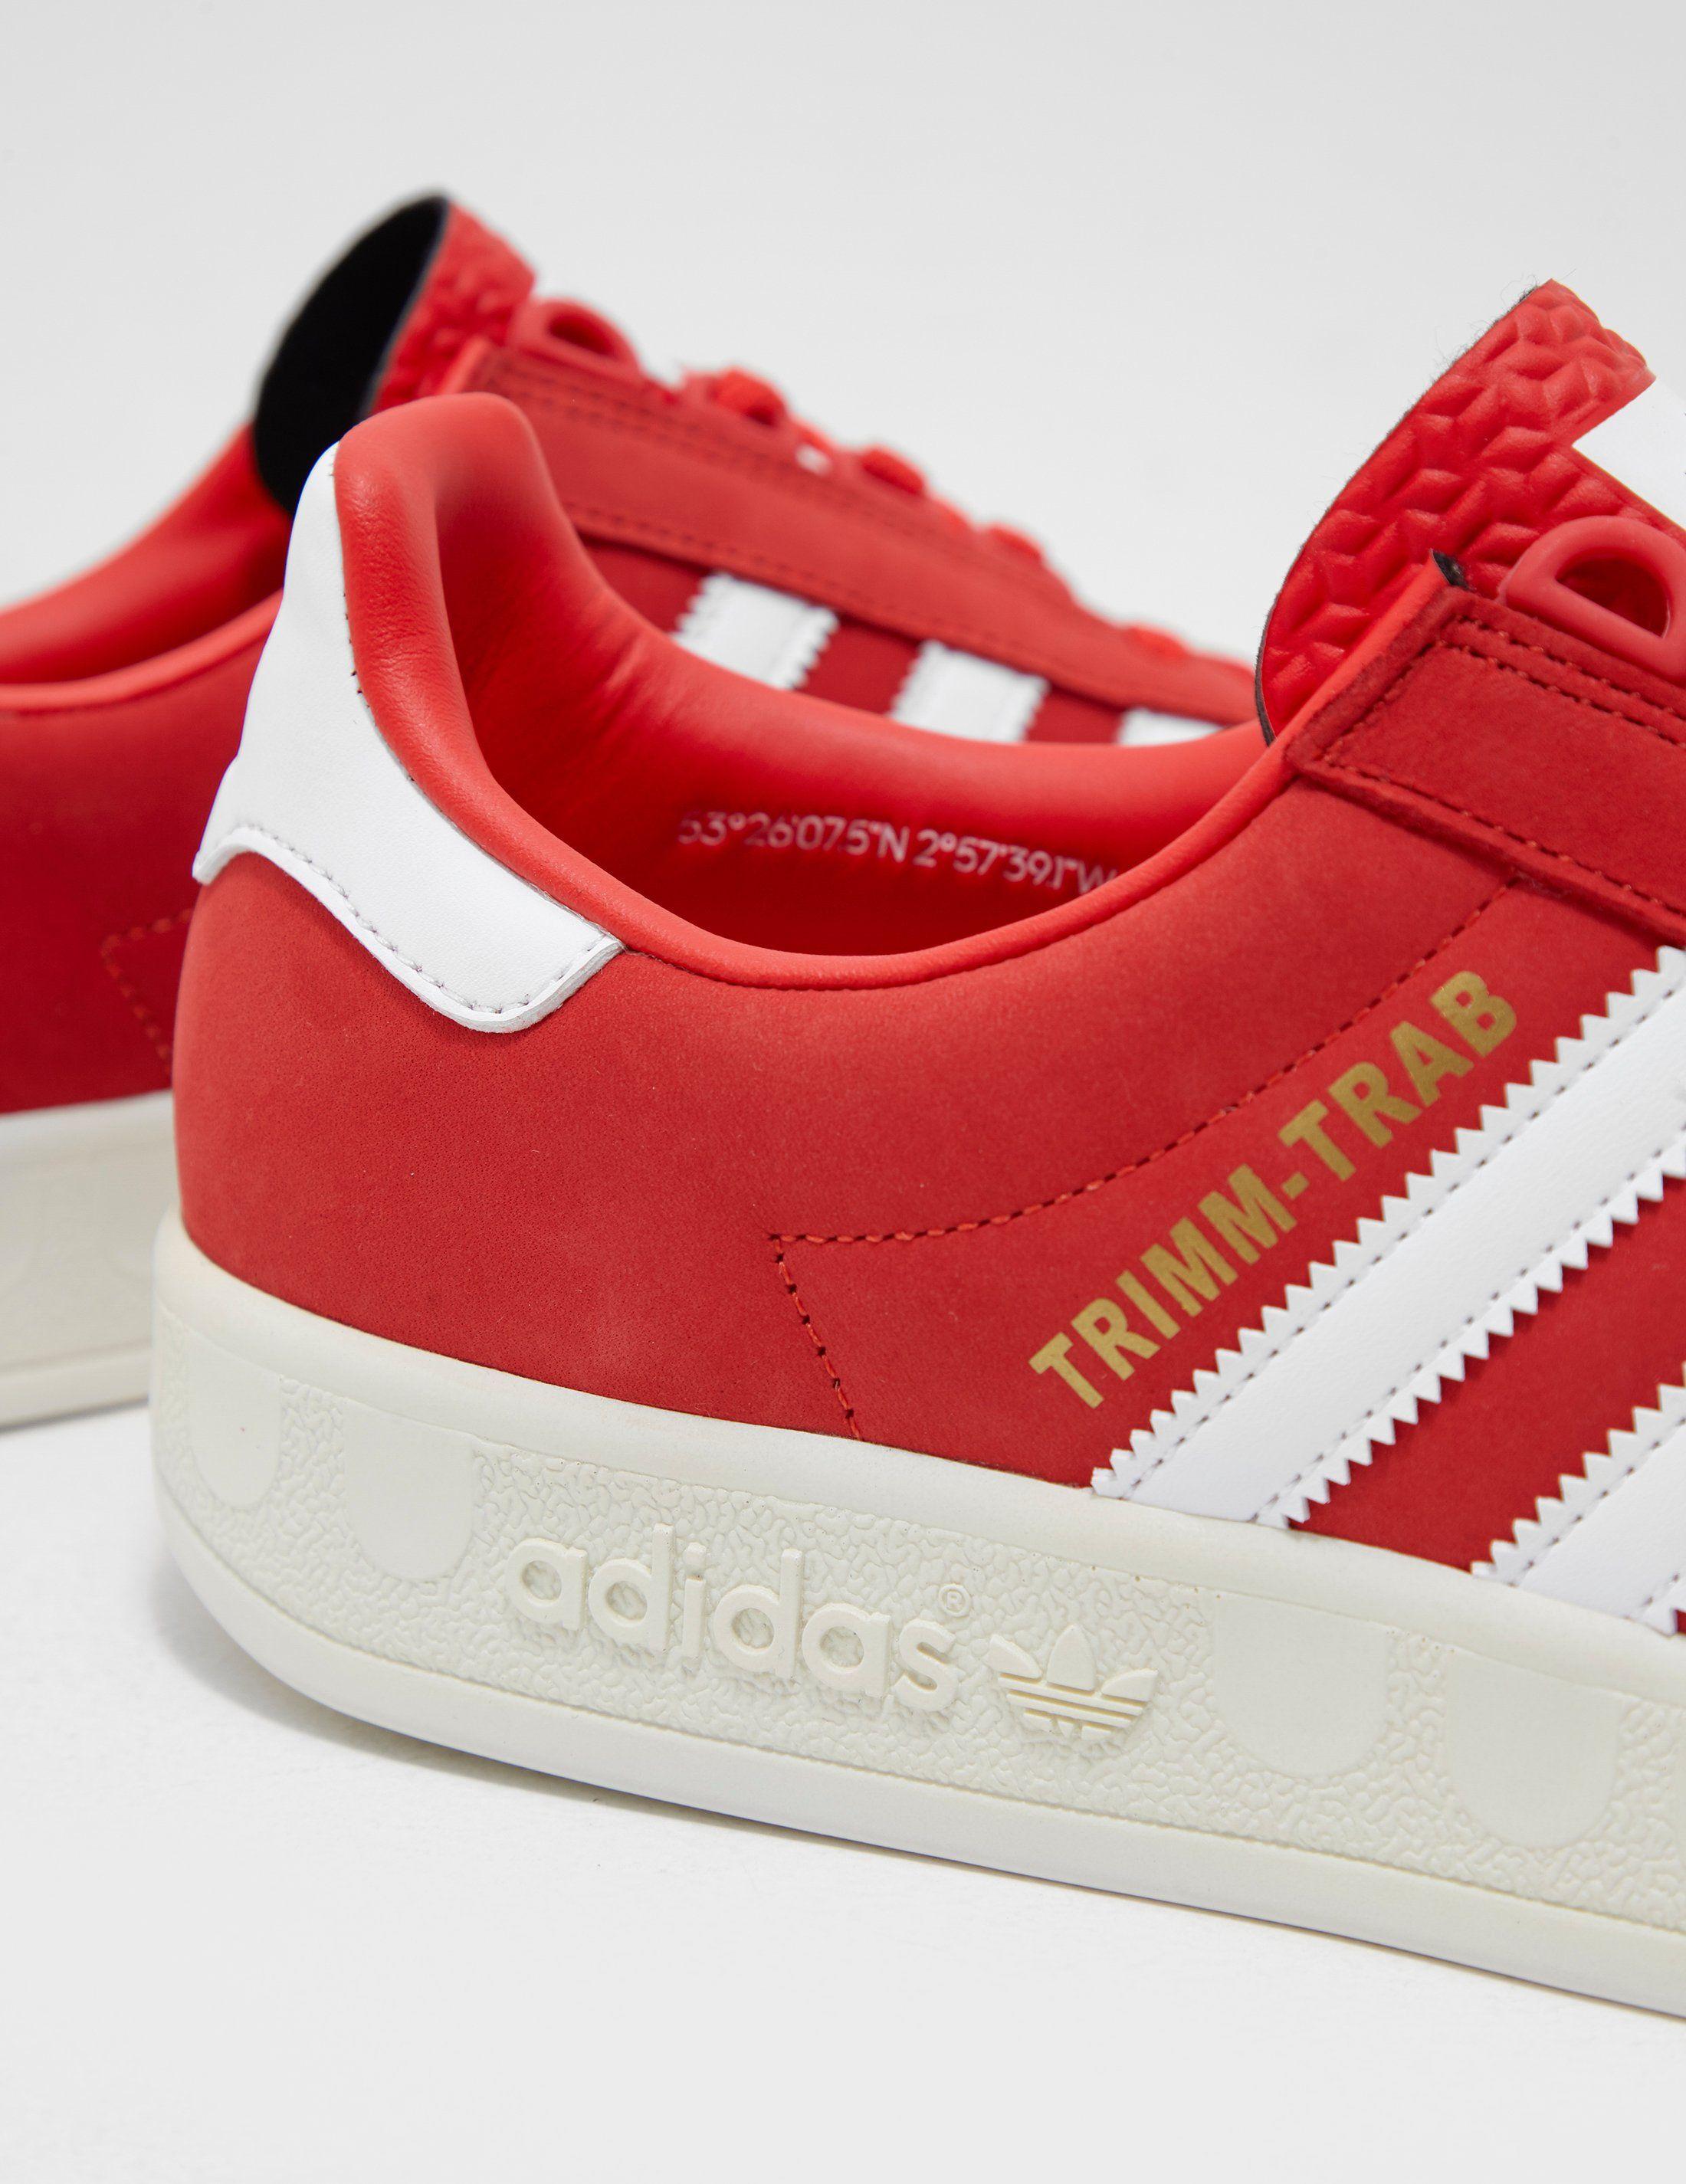 adidas Originals Trimm Trab 'Rivalry Pack'